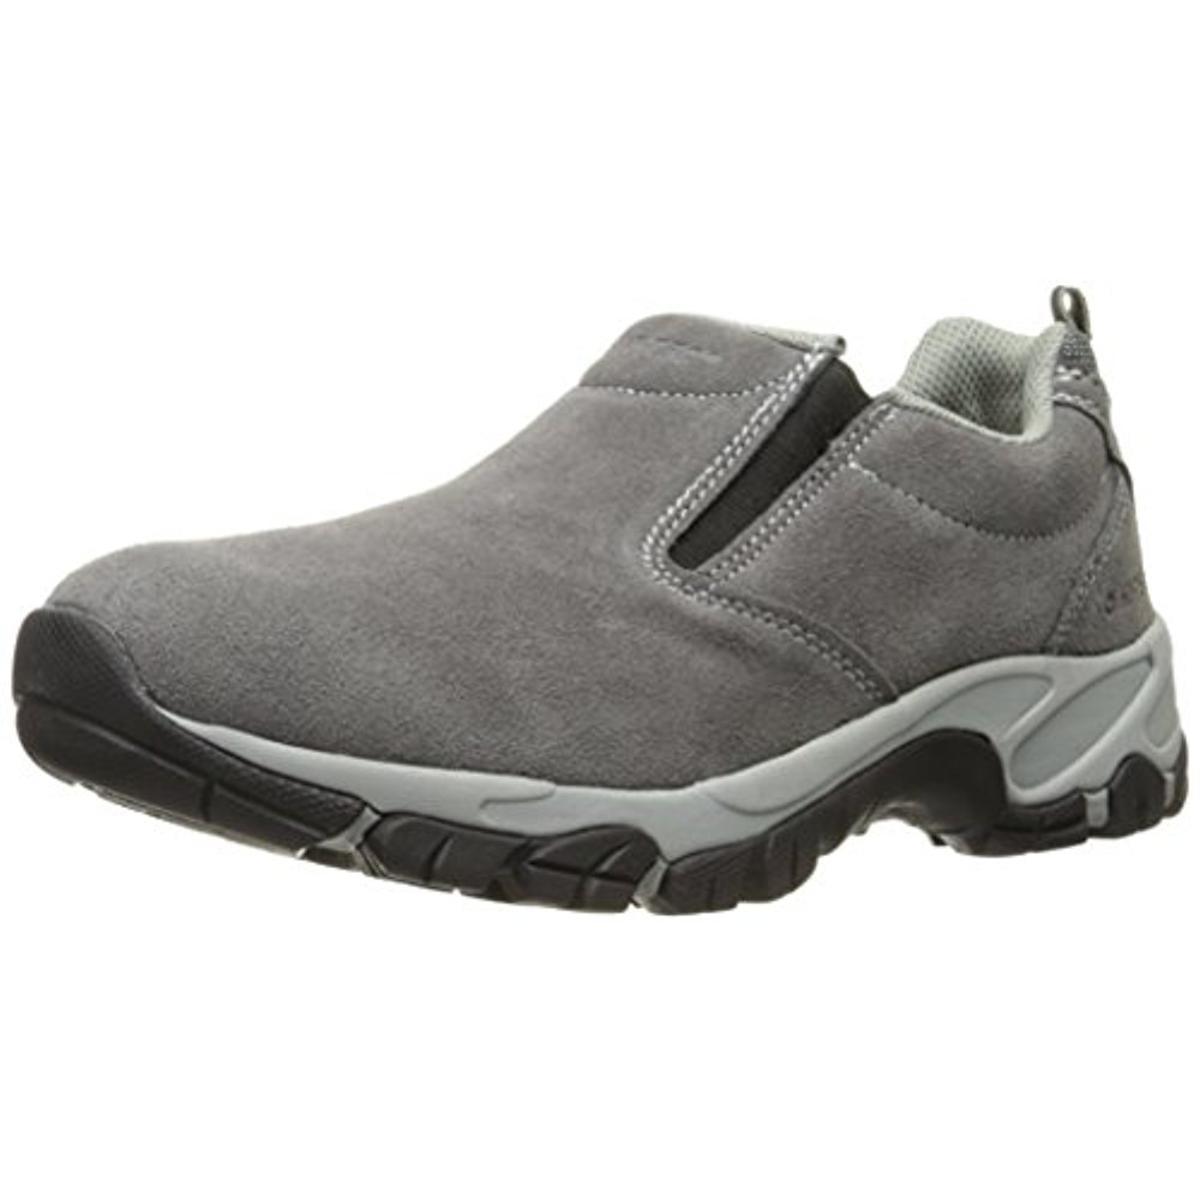 Hi-Tec Womens Altitude Moc Suede Ortholite Casual Shoes by Hi-Tec